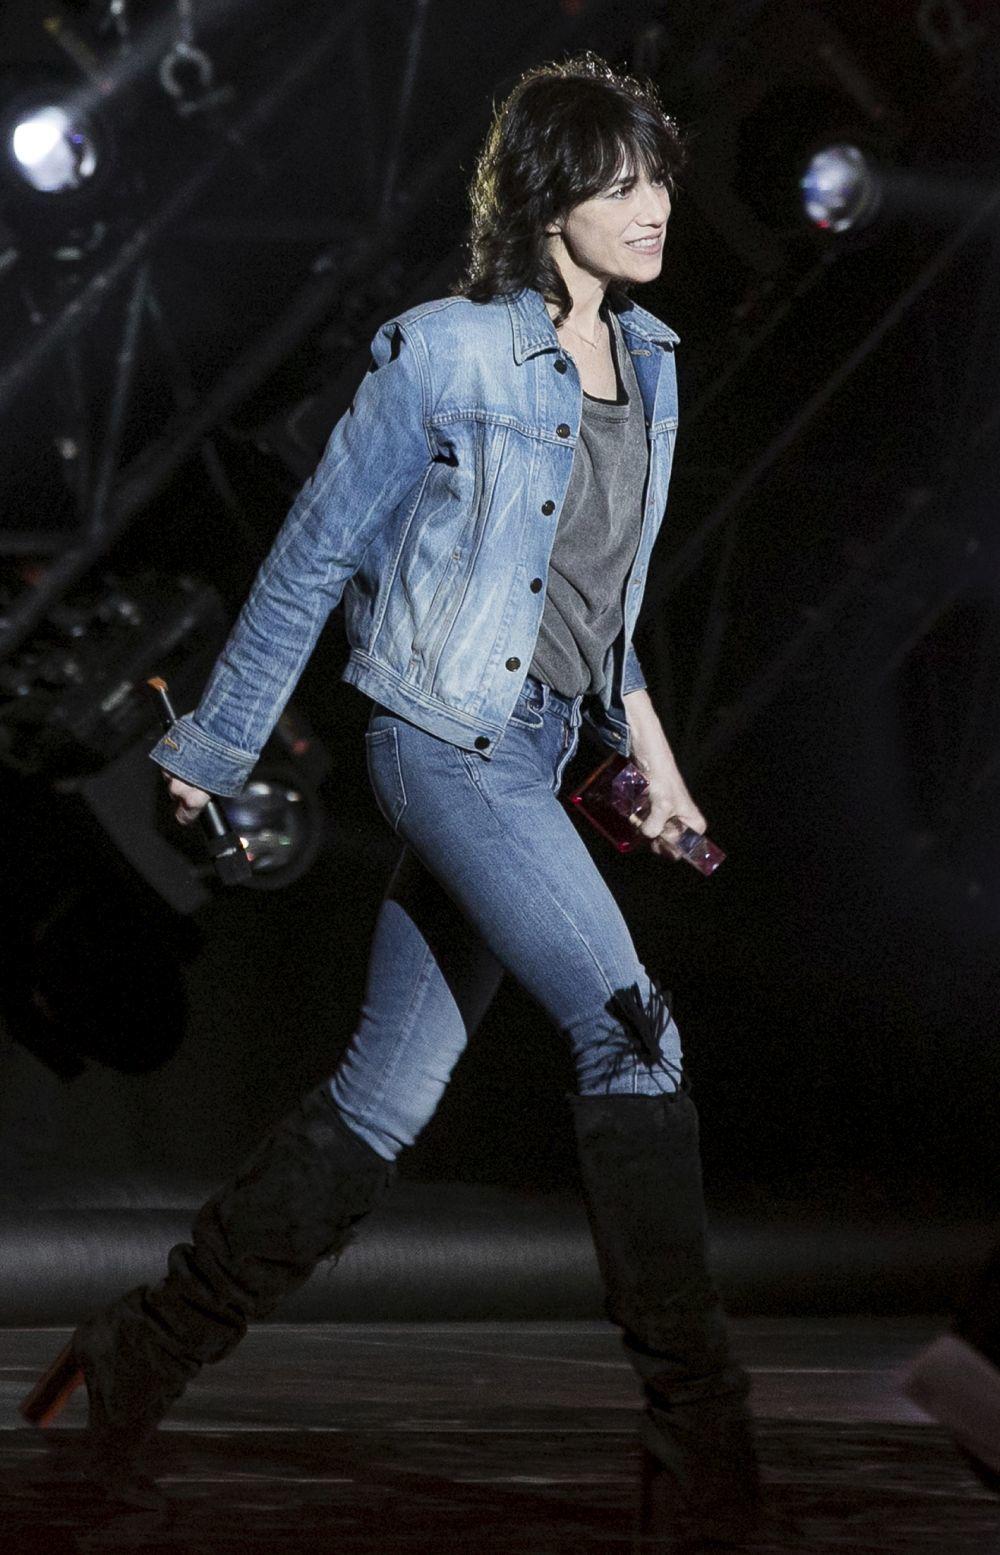 Charlotte Gainsbourg en concierto